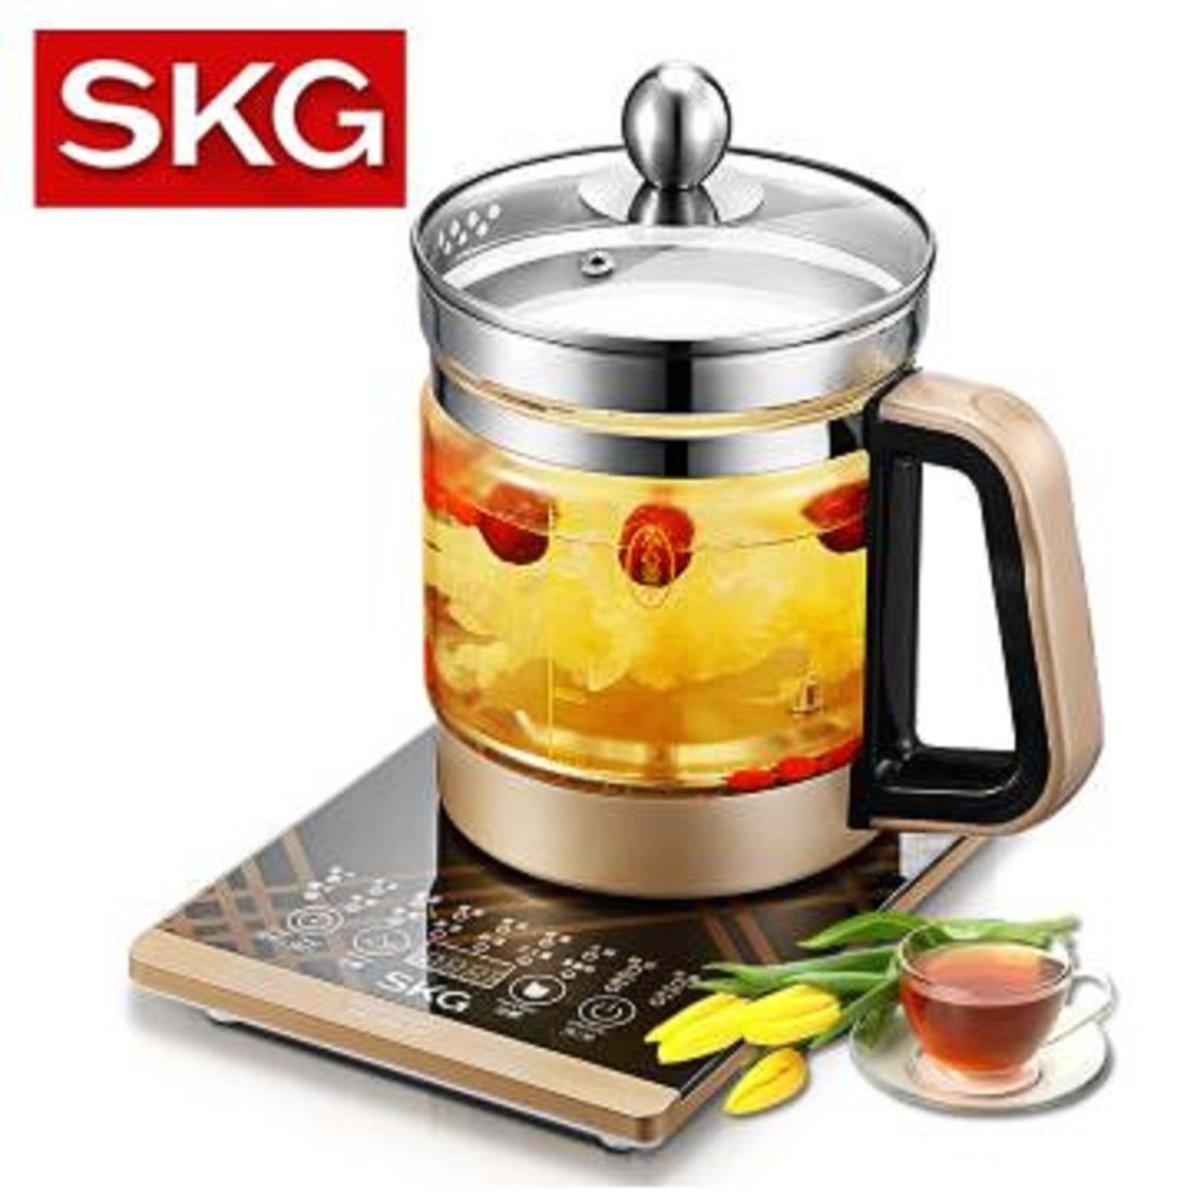 SKG 8049 多功能養生壼加厚電玻璃全自動中藥壼